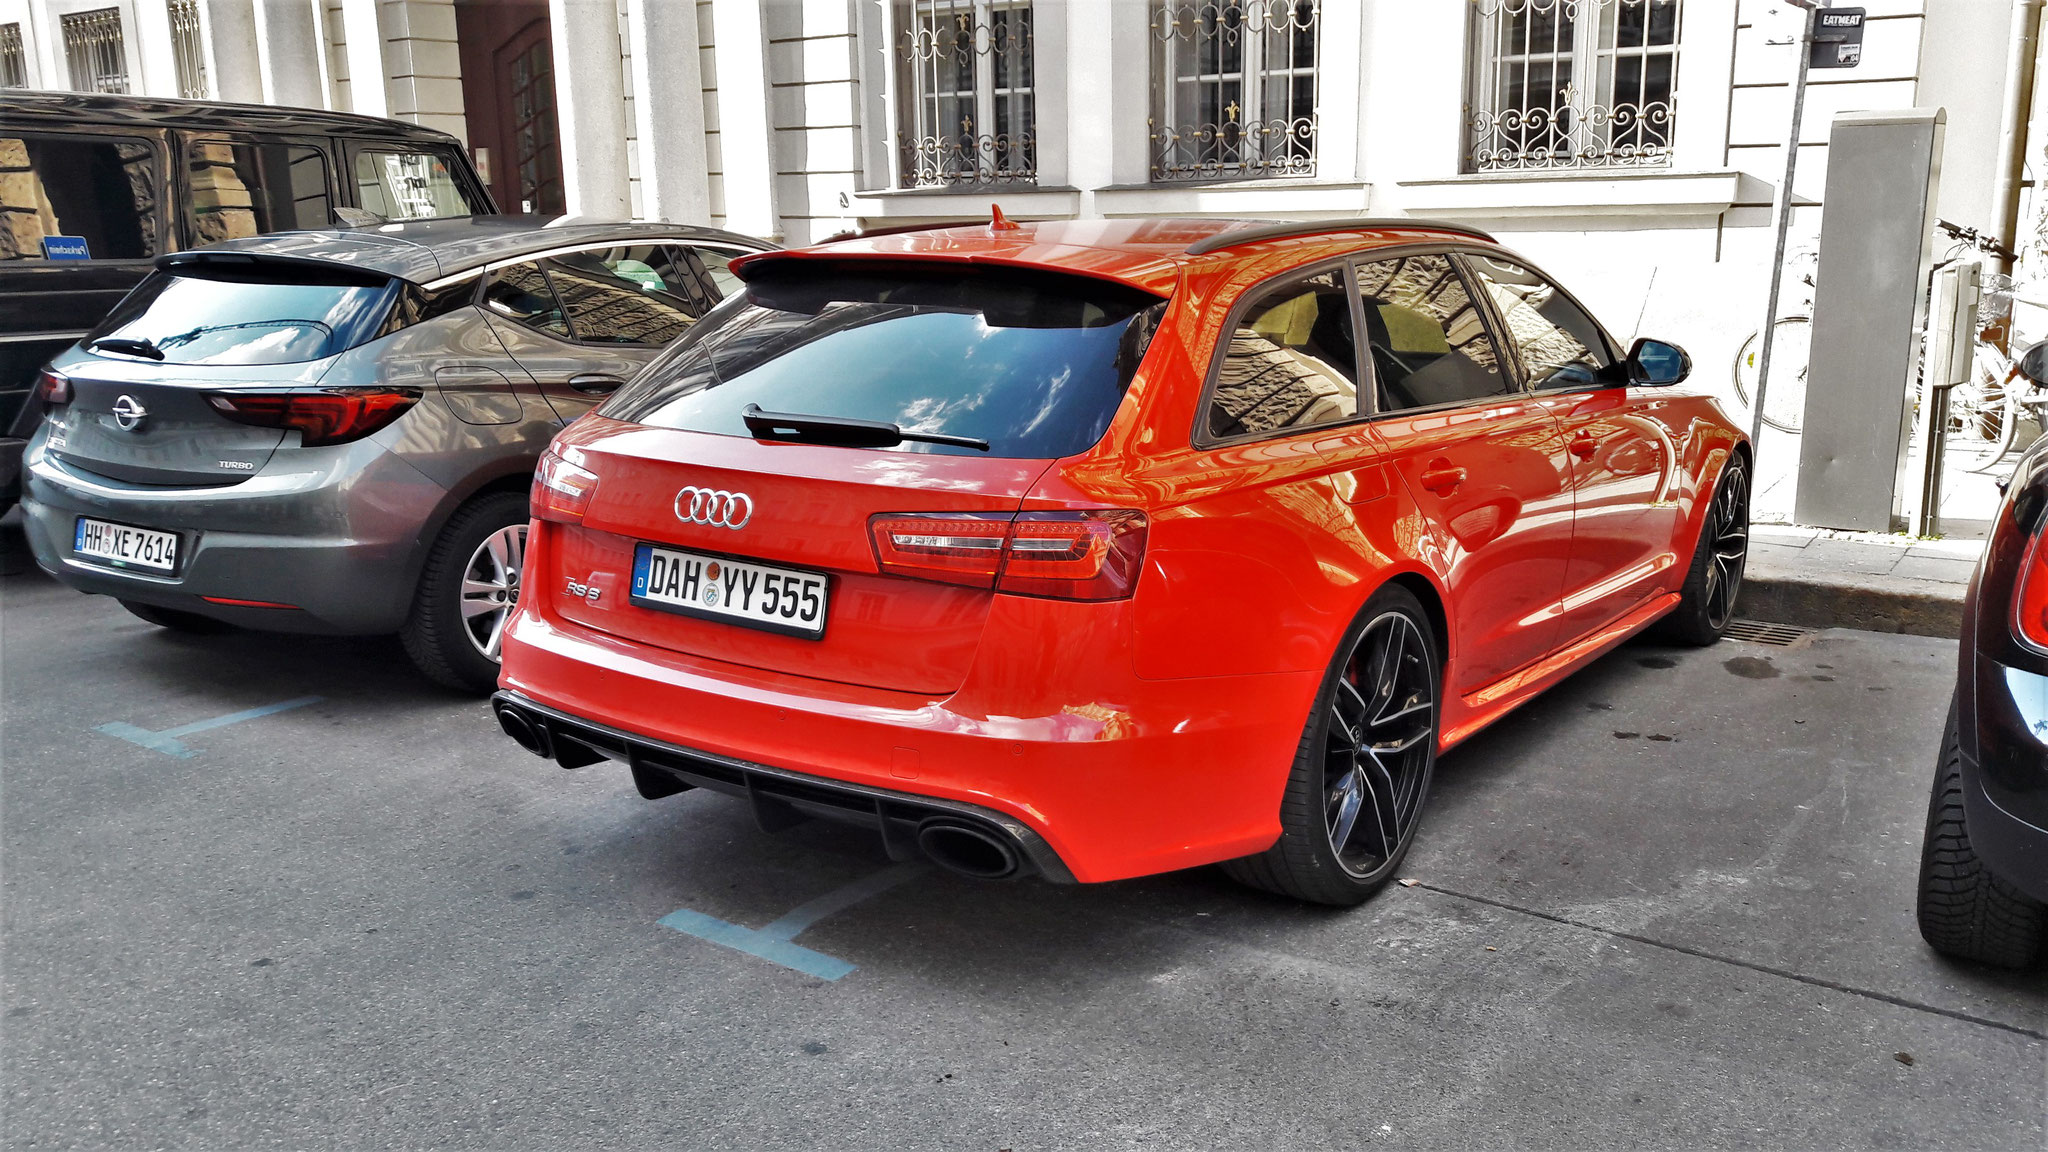 Audi RS6 - DAH-YY-555